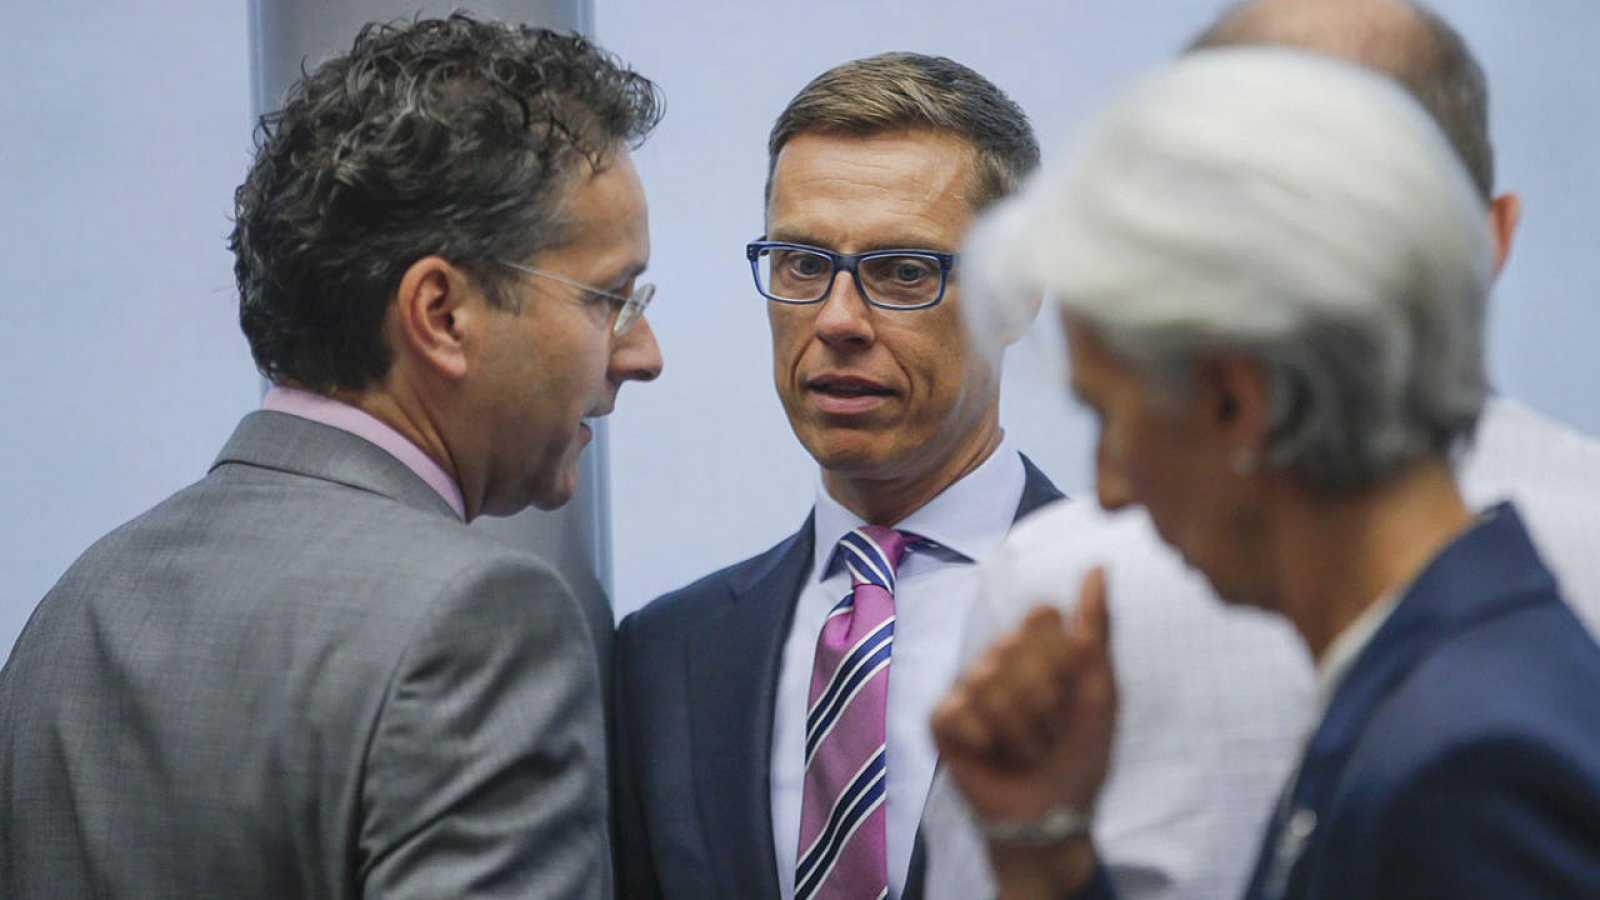 Jeroen Dijsselbloem (i) el finlandés Alexander Stubb (C) y Christine Lagarde en el Eurogrupo